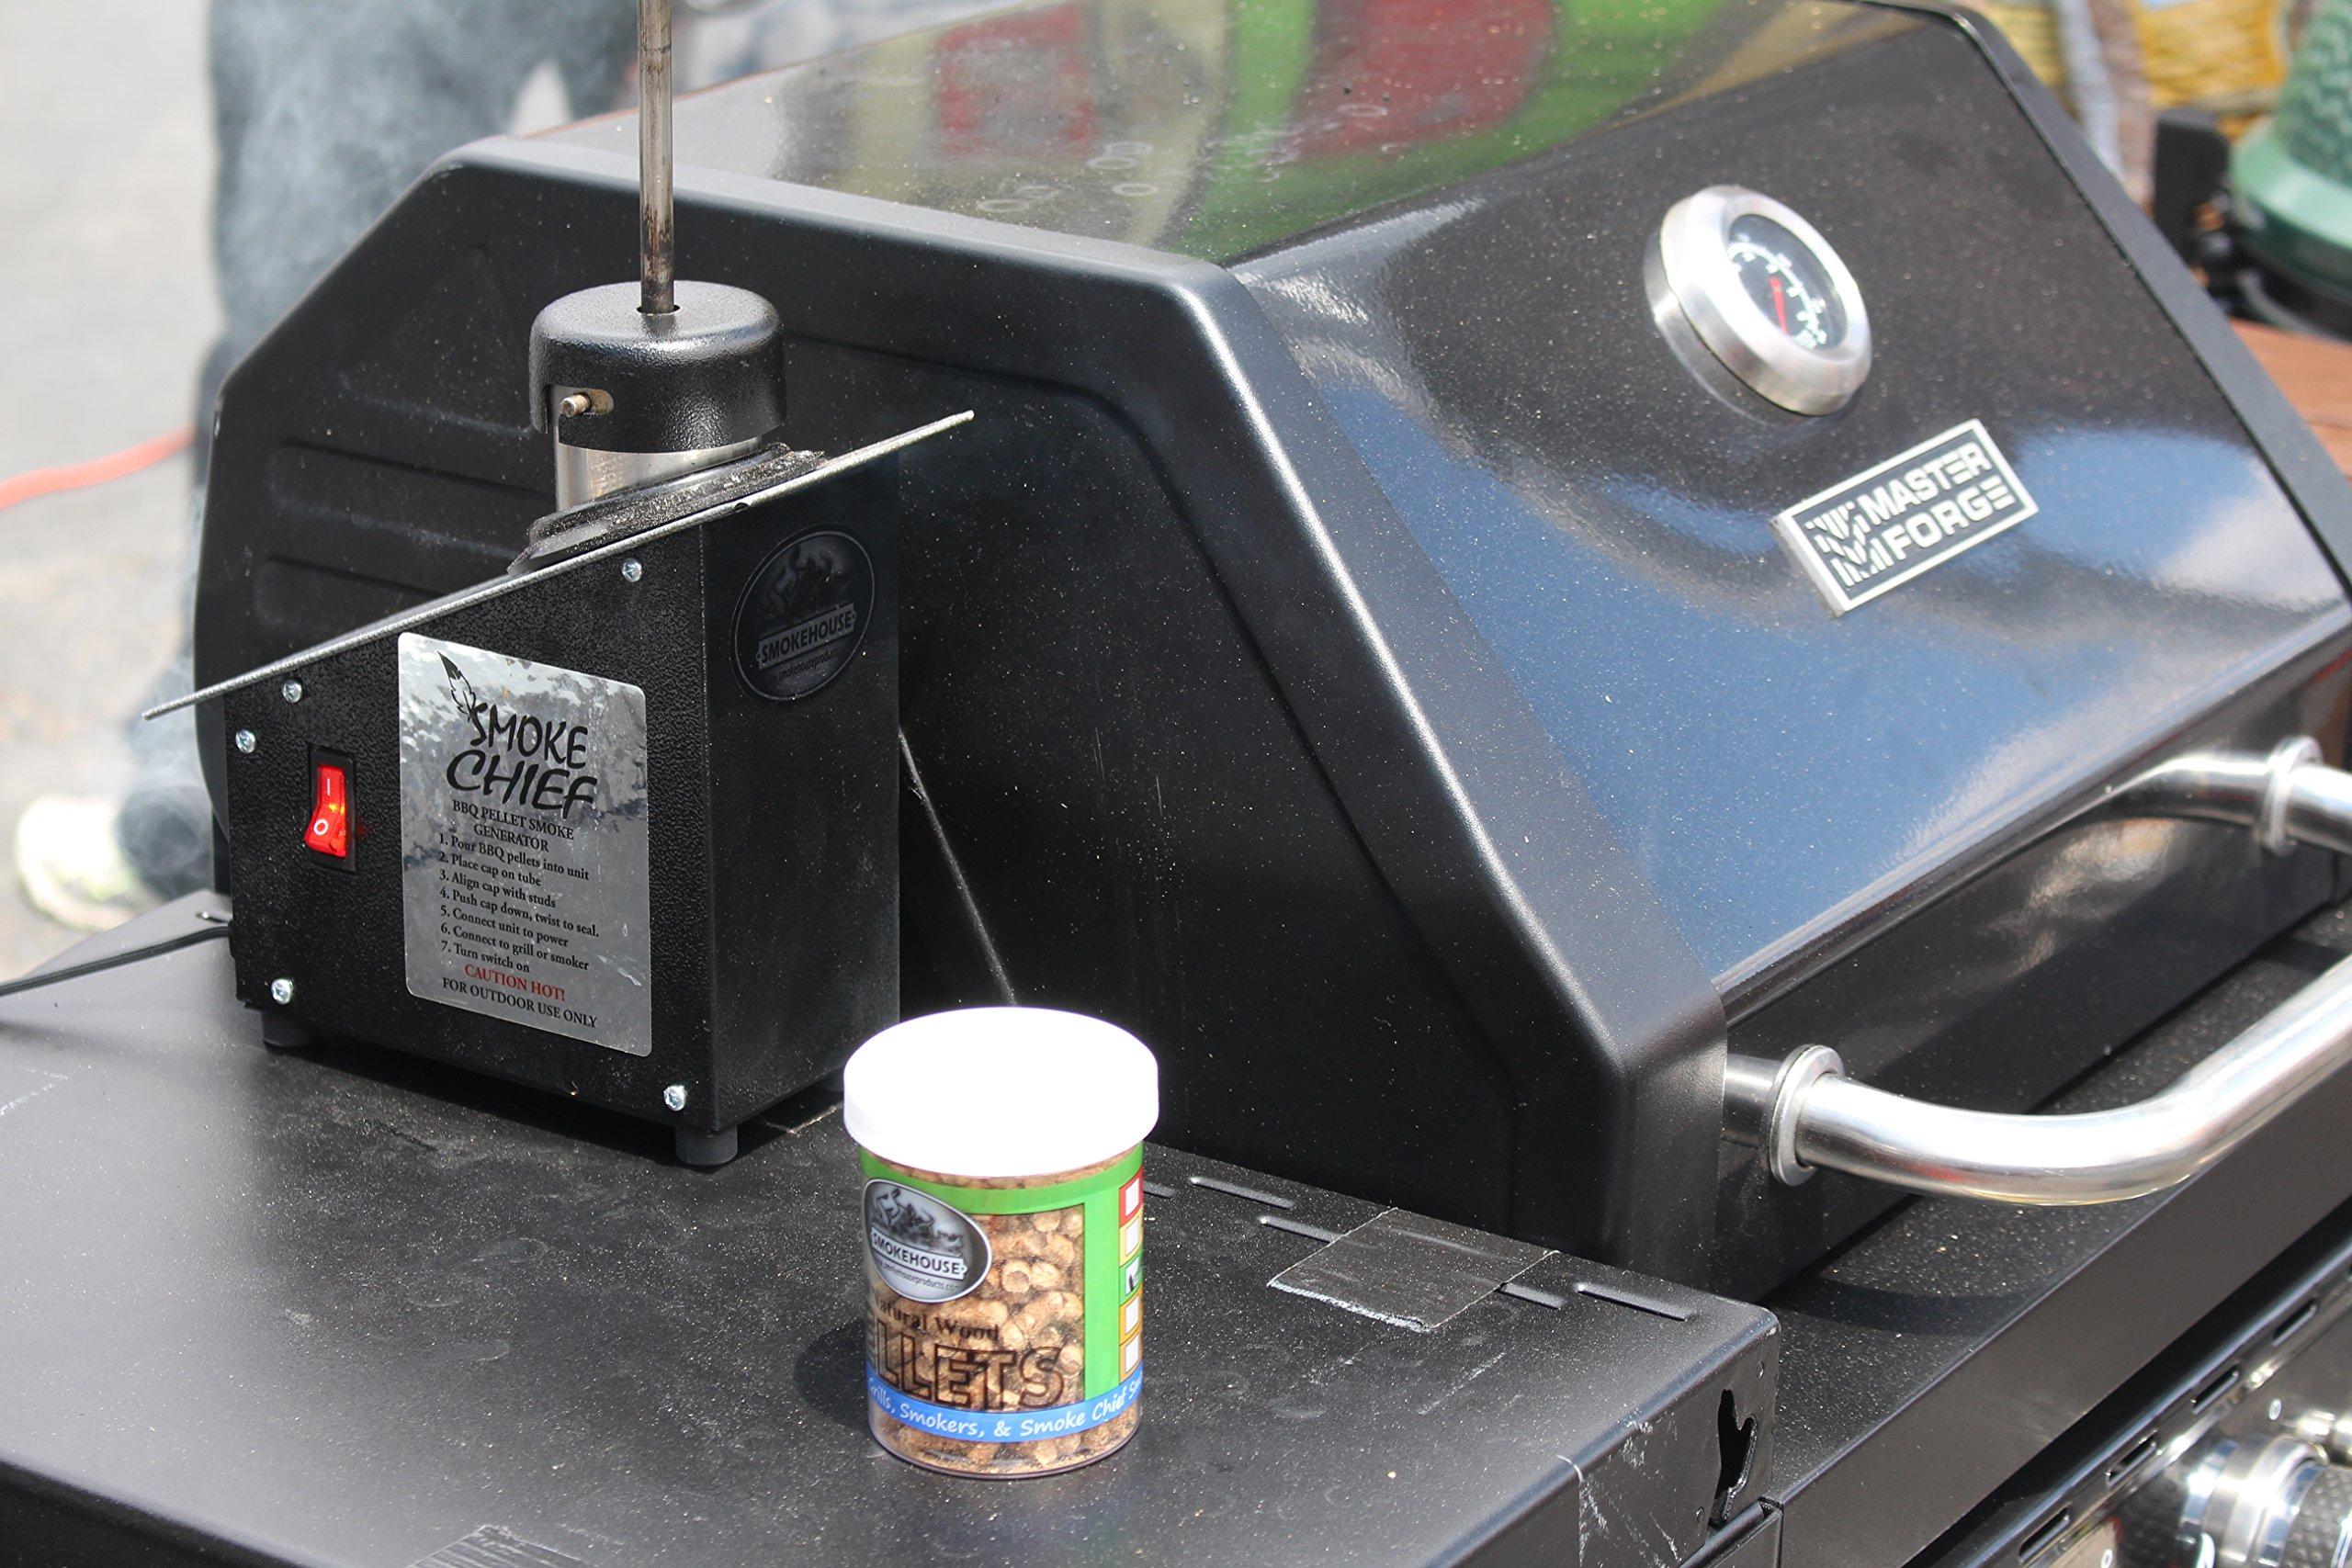 Smokehouse Products 9500-000-0000 Smoke Chief Cold Smoke Generator by SmokeHouse (Image #4)